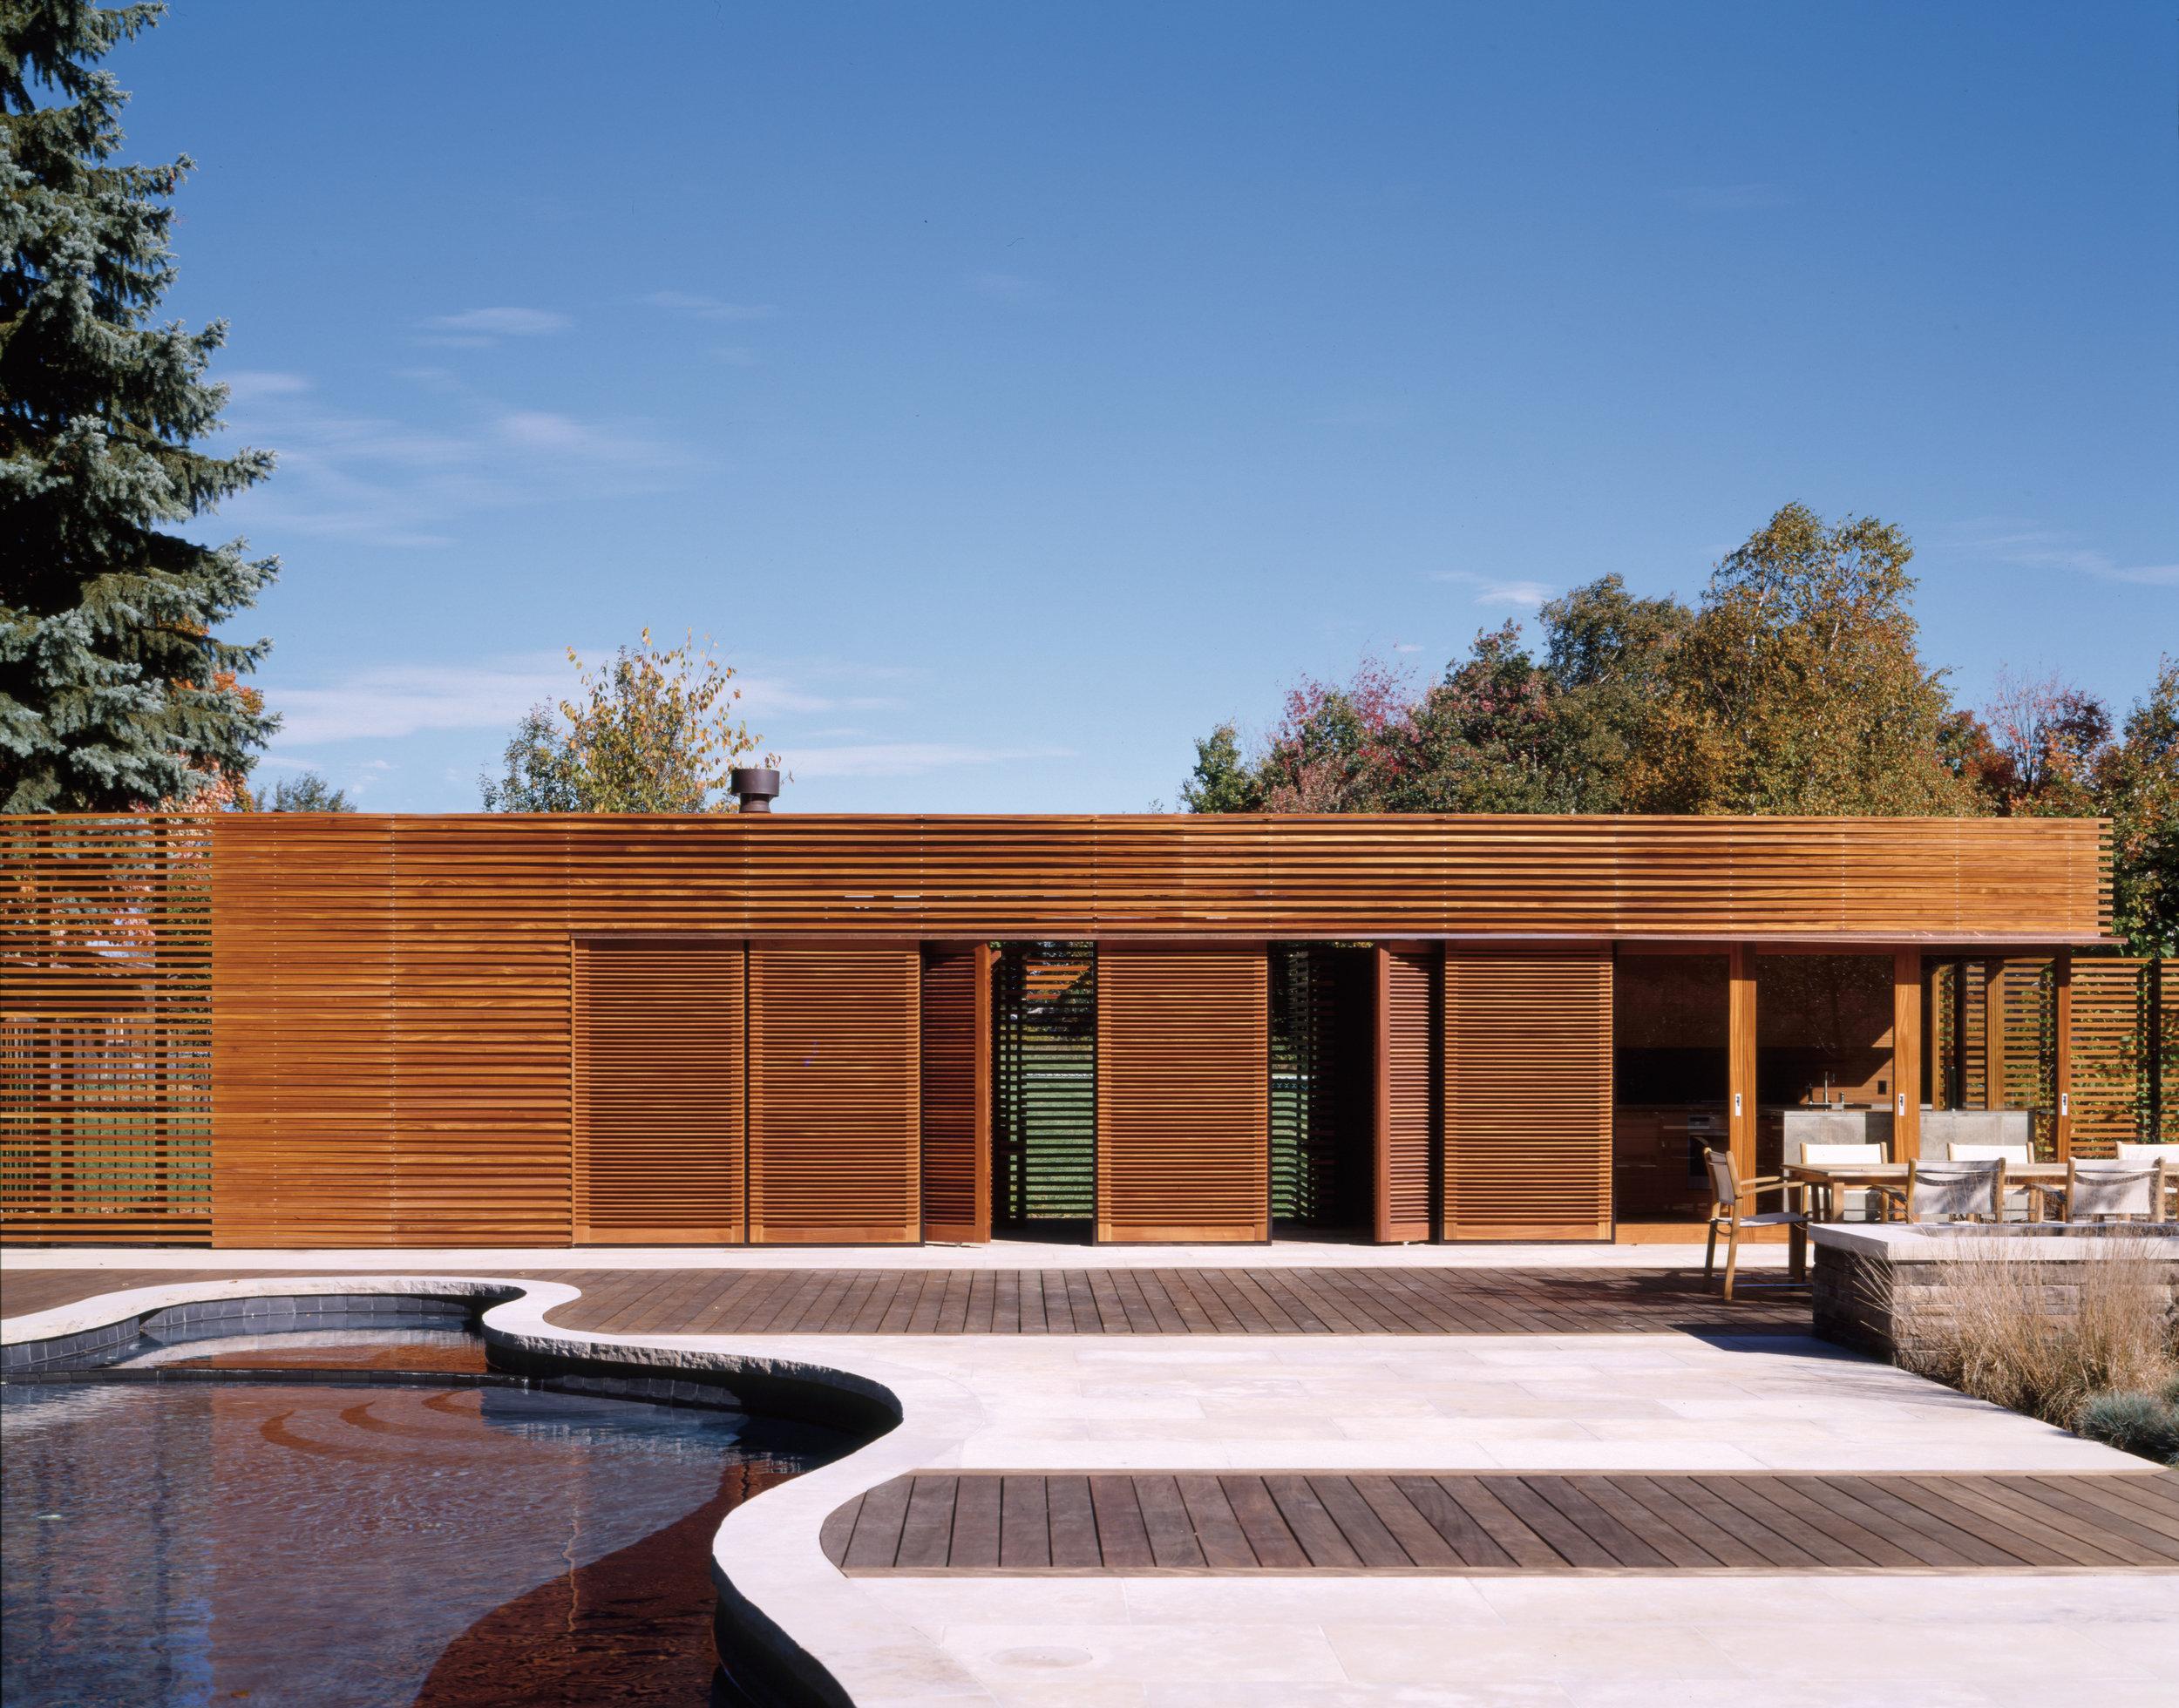 Kleinburg Pool Pavilion